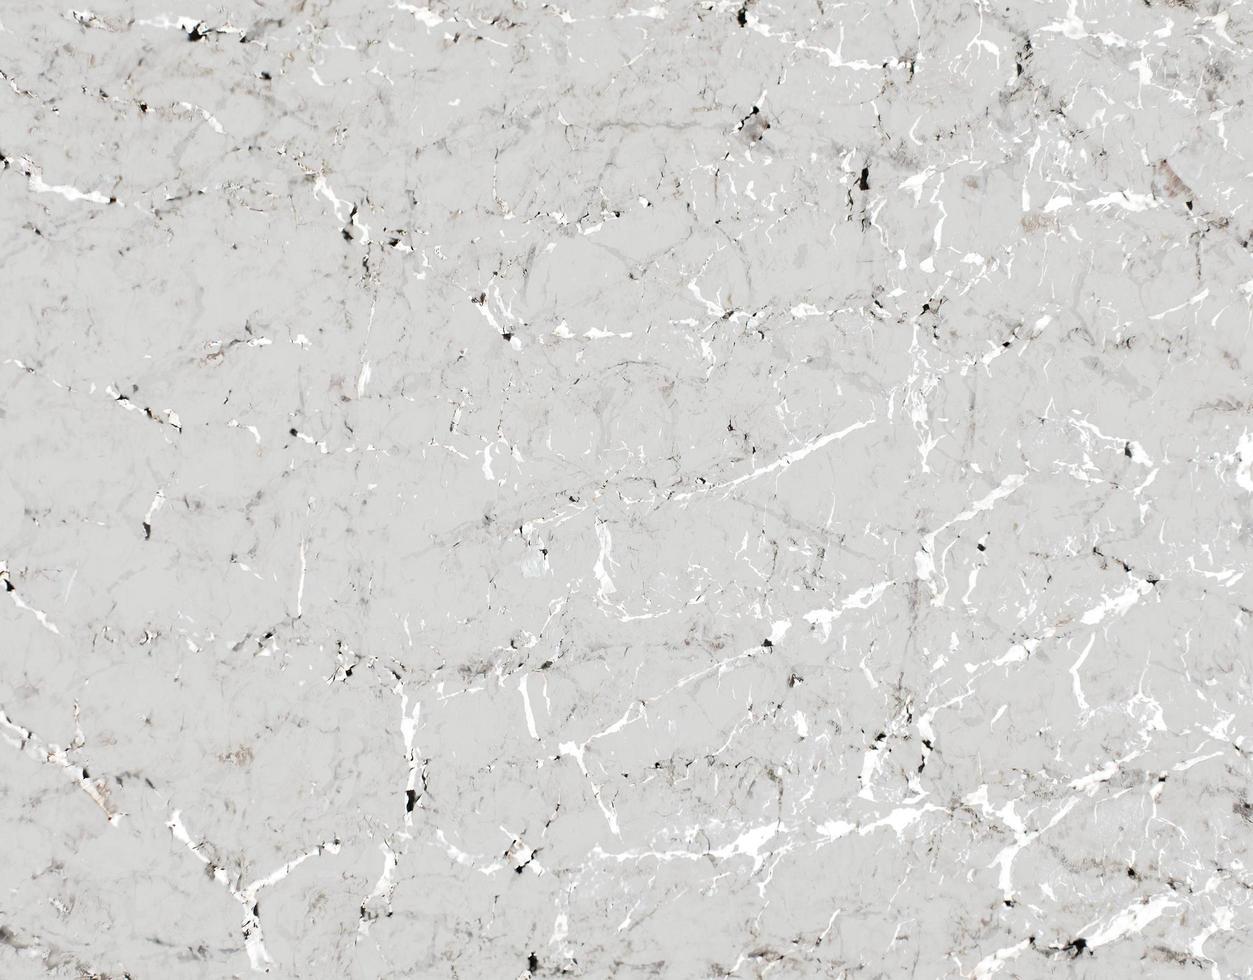 Marble granite texture photo